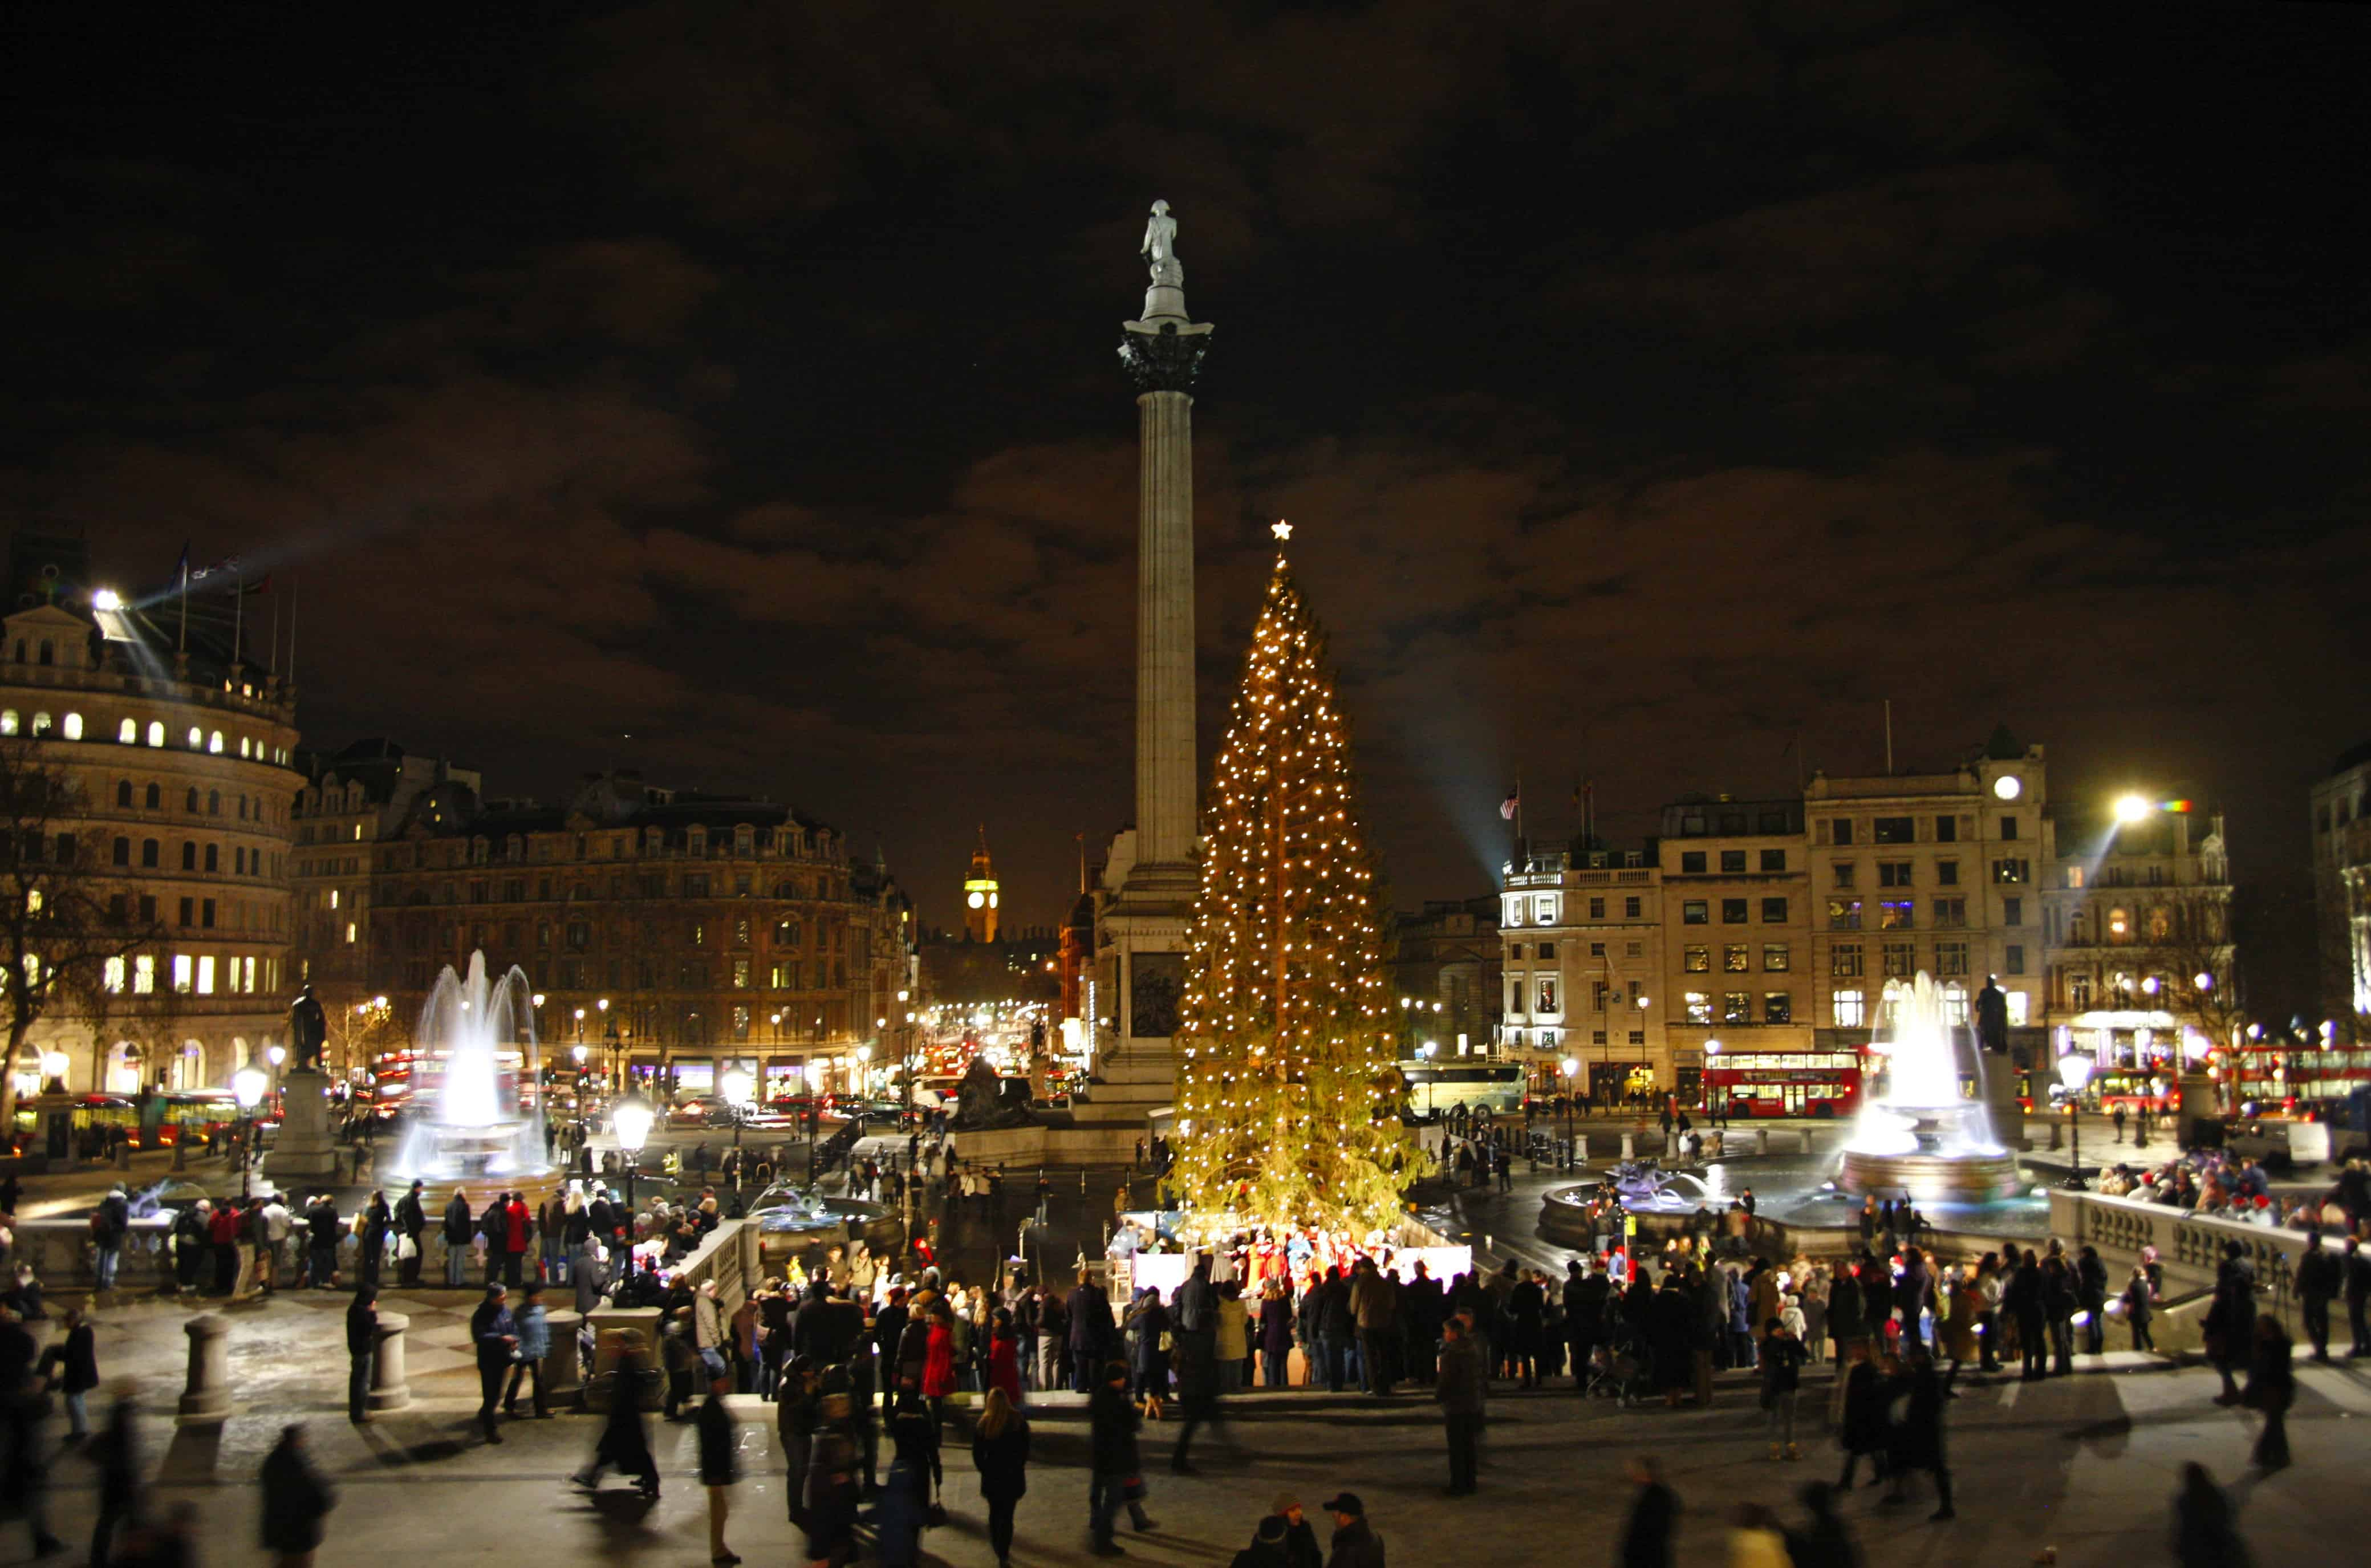 Manadatory Credit: Photo by Paul Brown / Rex Features (1065036d) Trafalgar Square Christmas Tree in London, England, Britain Trafalgar Square Christmas Tree in London, Britain - 19 Dec 2009